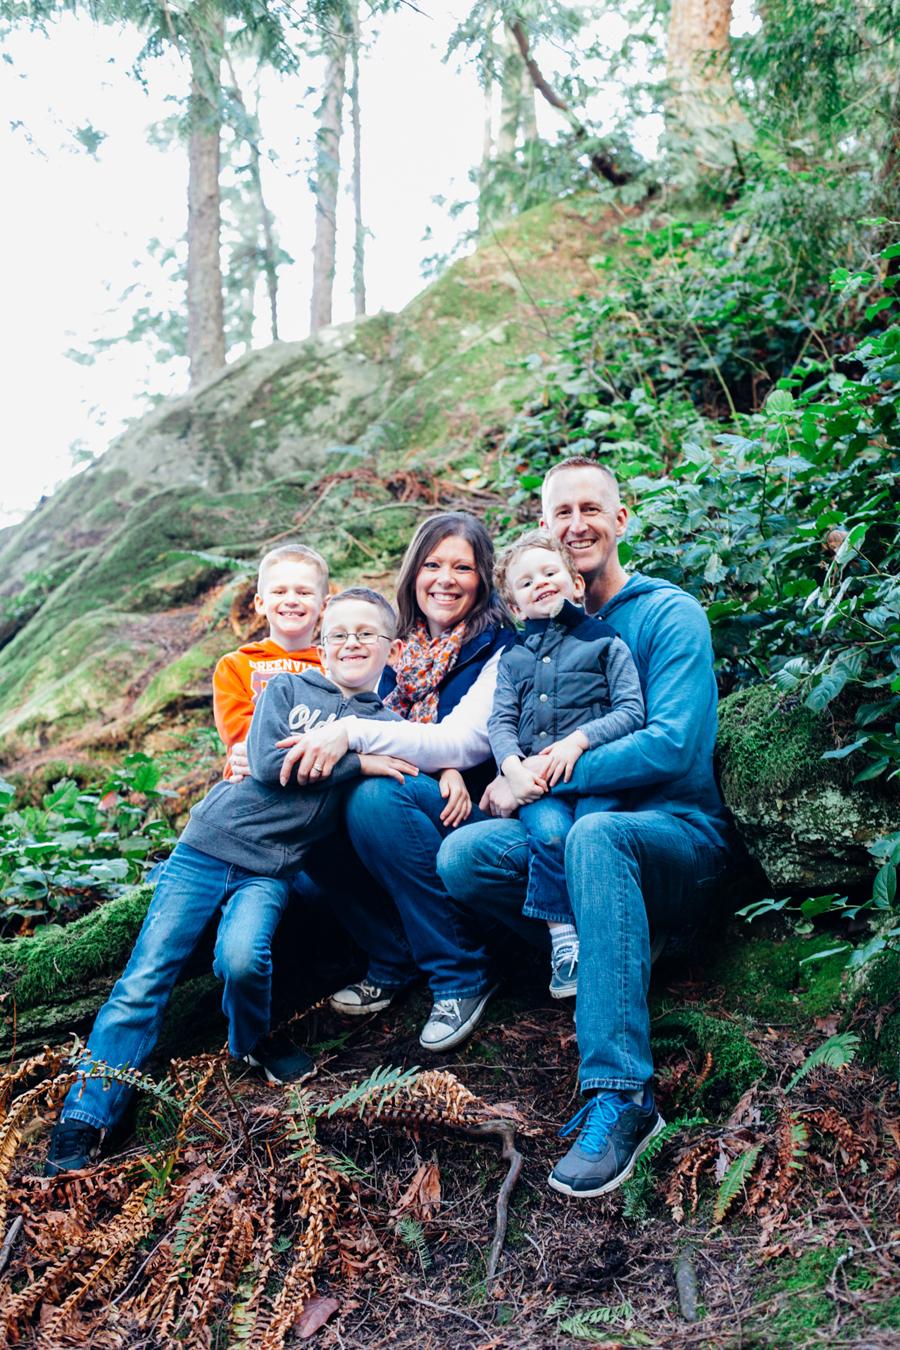 018-bellingham-family-photographer-ambritt-family-larrabee-state-park-katheryn-moran-photography.jpg